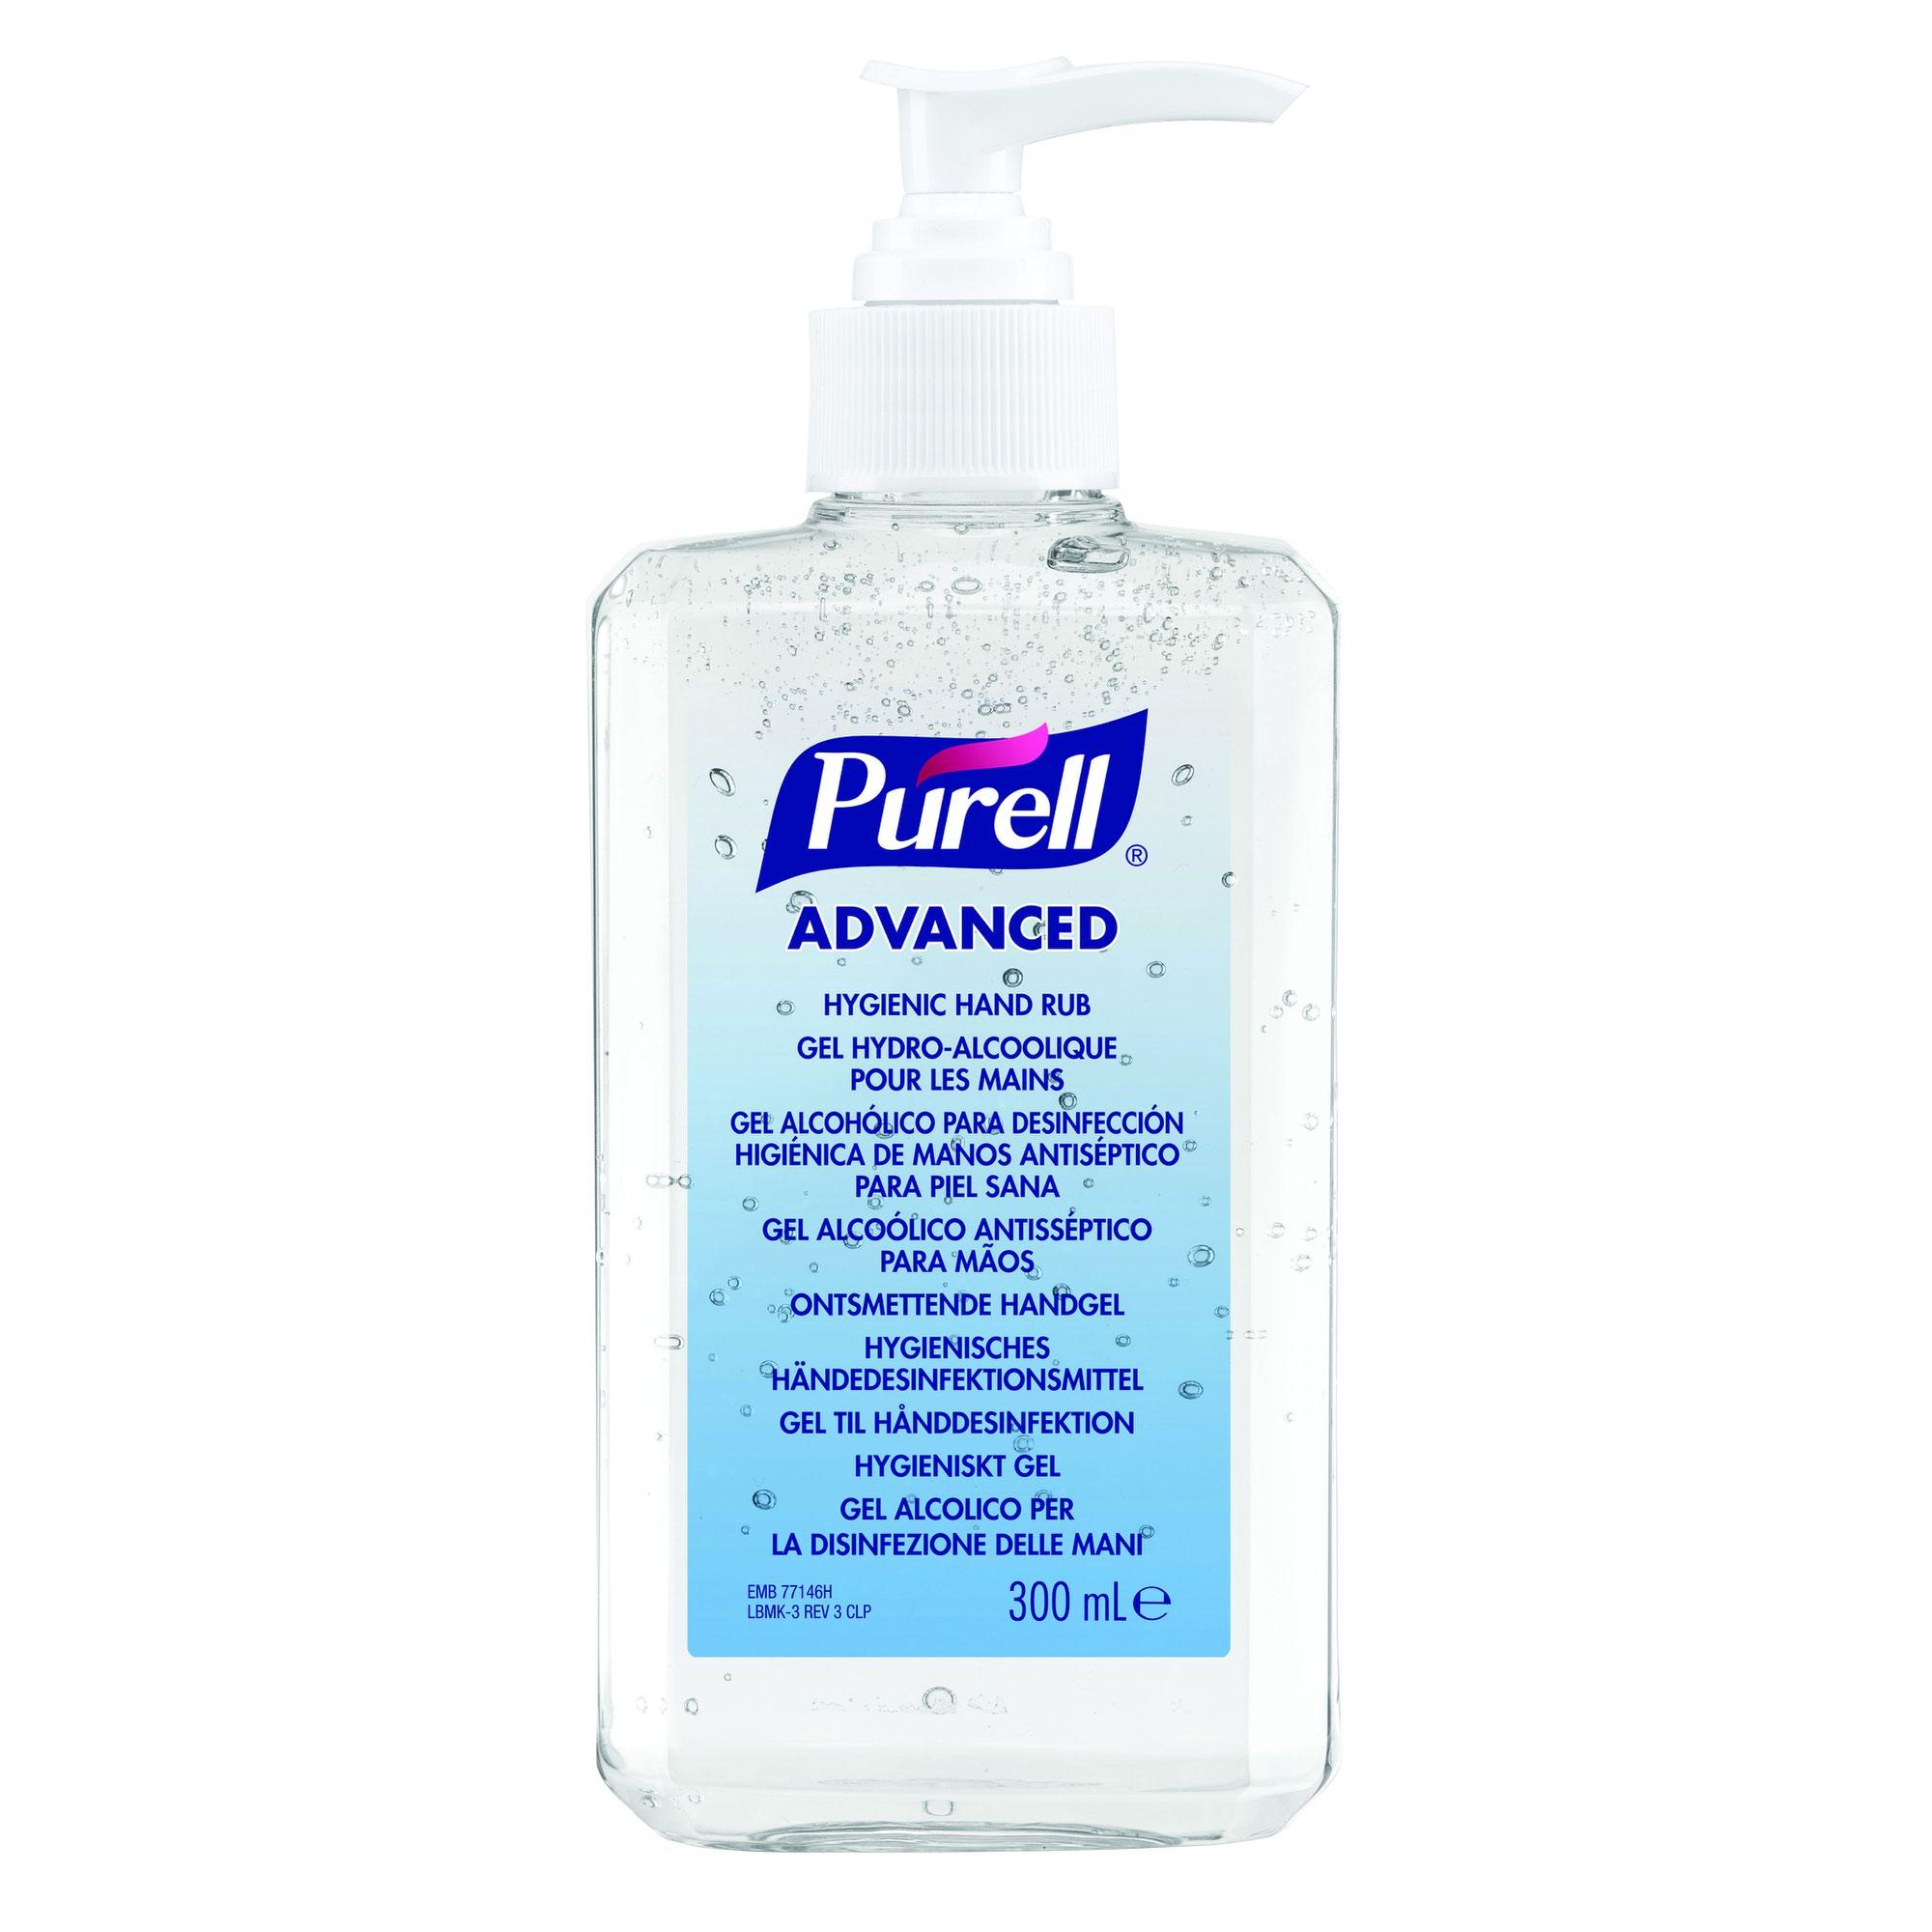 PURELL Advanced Hygienic Hand Rub 350ml 9659-12-EEU0